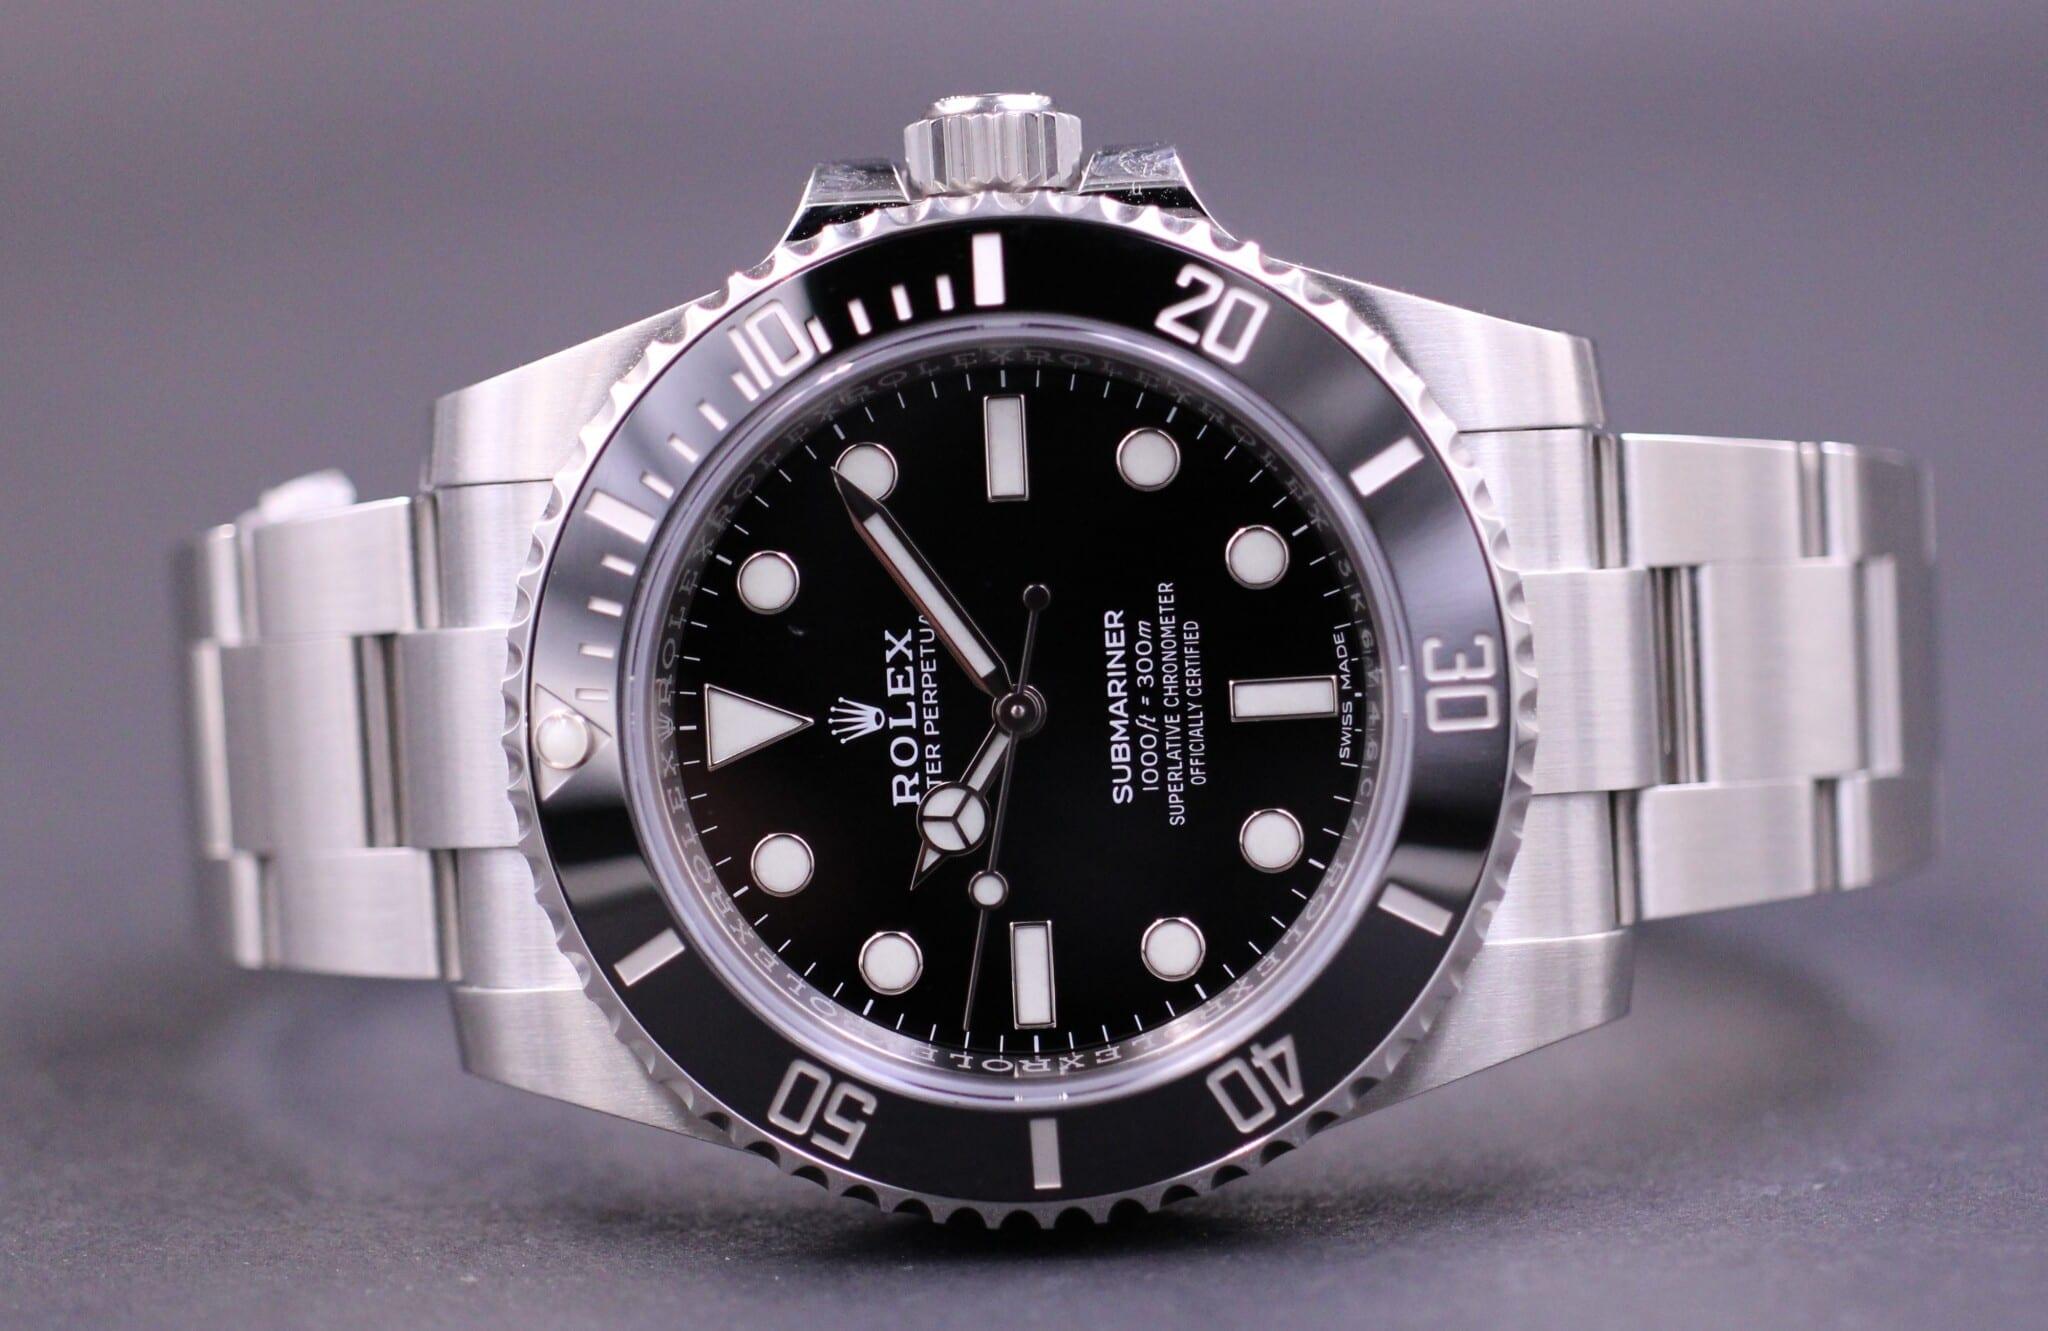 6501b33d495 Rolex Submariner 114060 - NEW   MM Watches